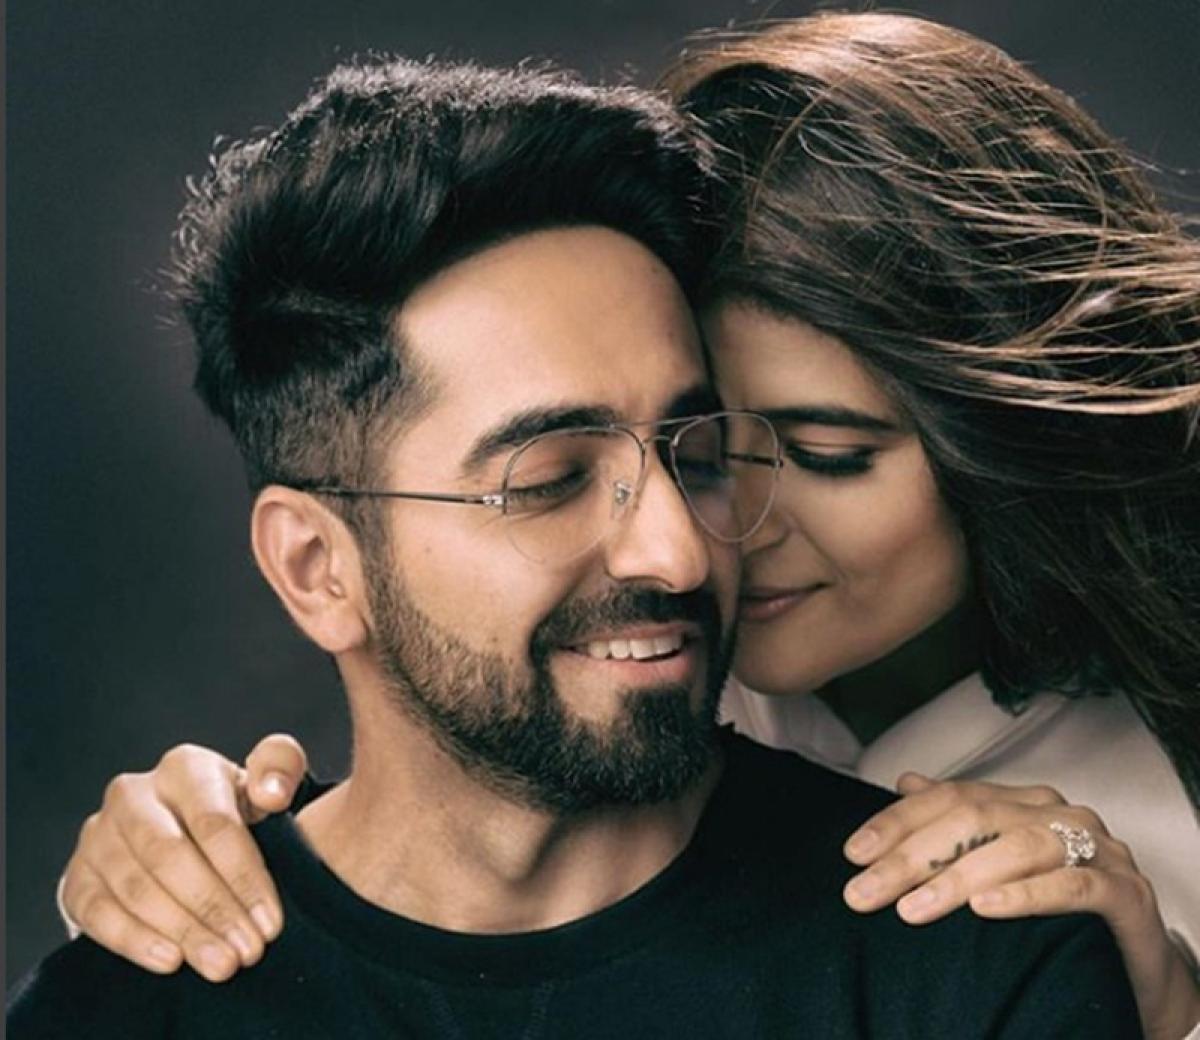 Badhaai Ho Ayushmann Khurrana and Tahira Kashyap for 10th wedding anniversary; see 'Andhadhun' actor's first marriage picture